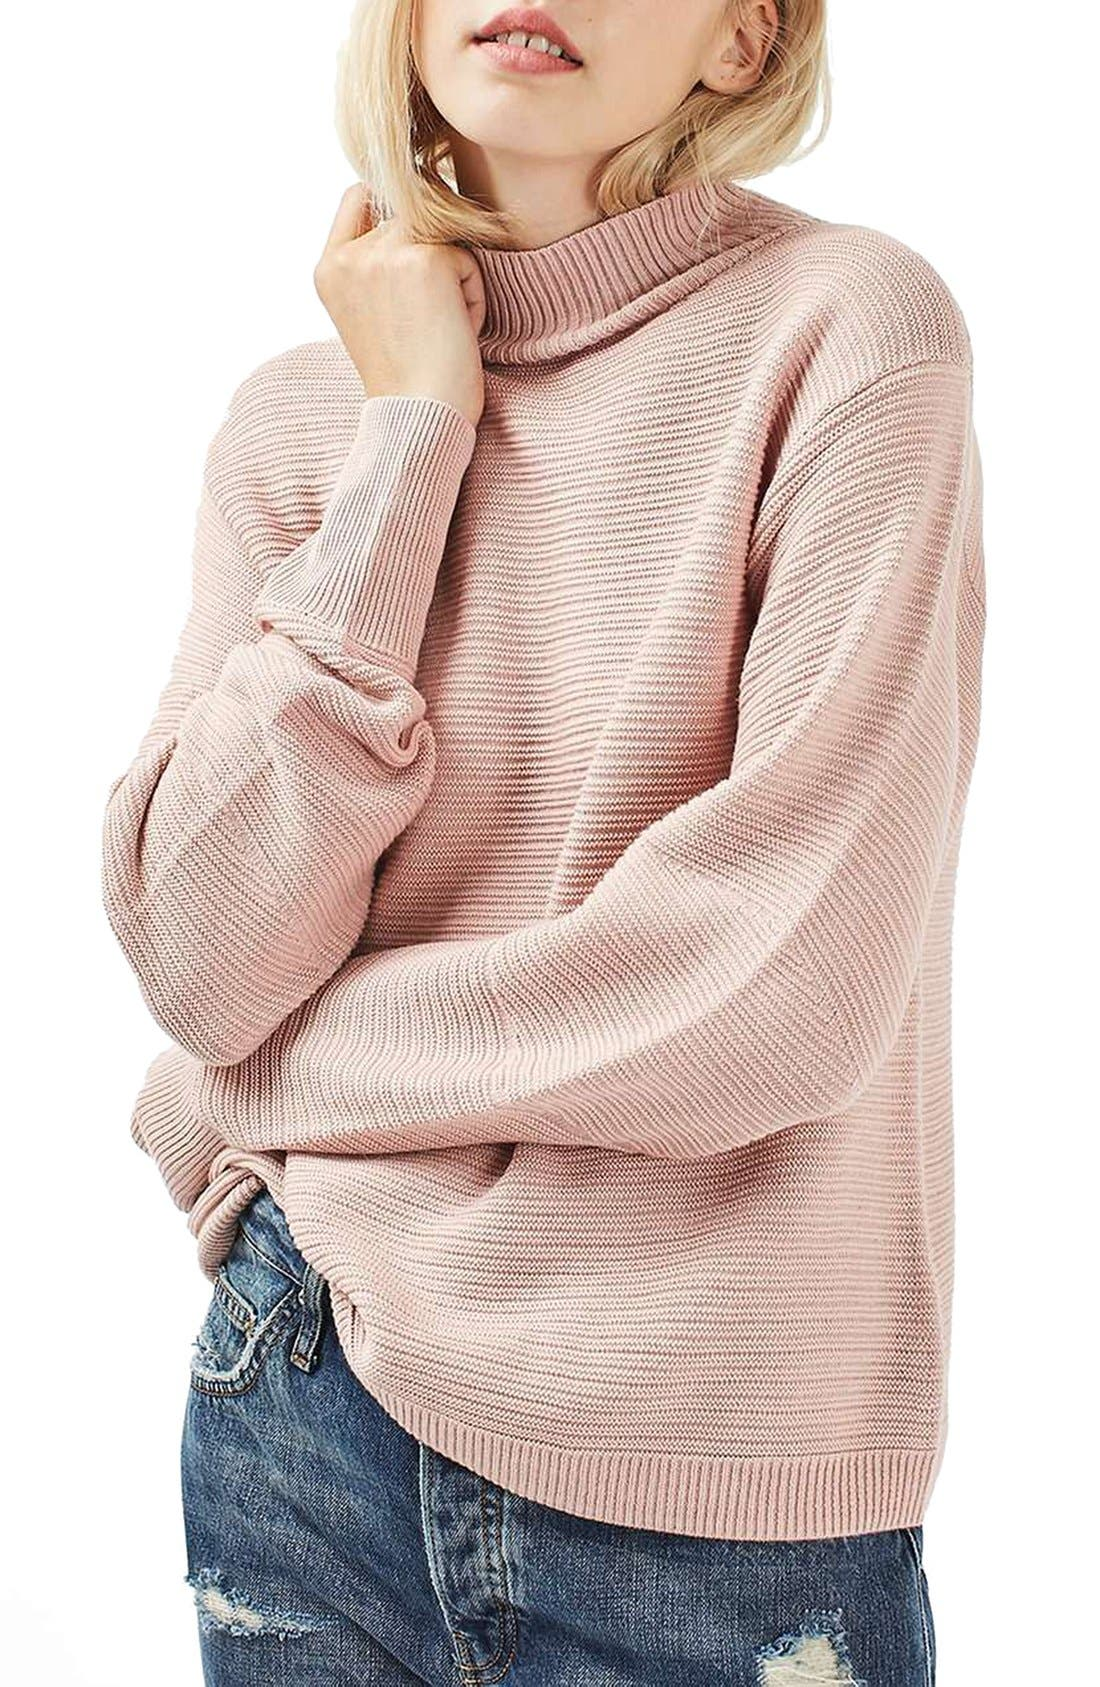 Main Image - Topshop Mixed Stitch Sweater